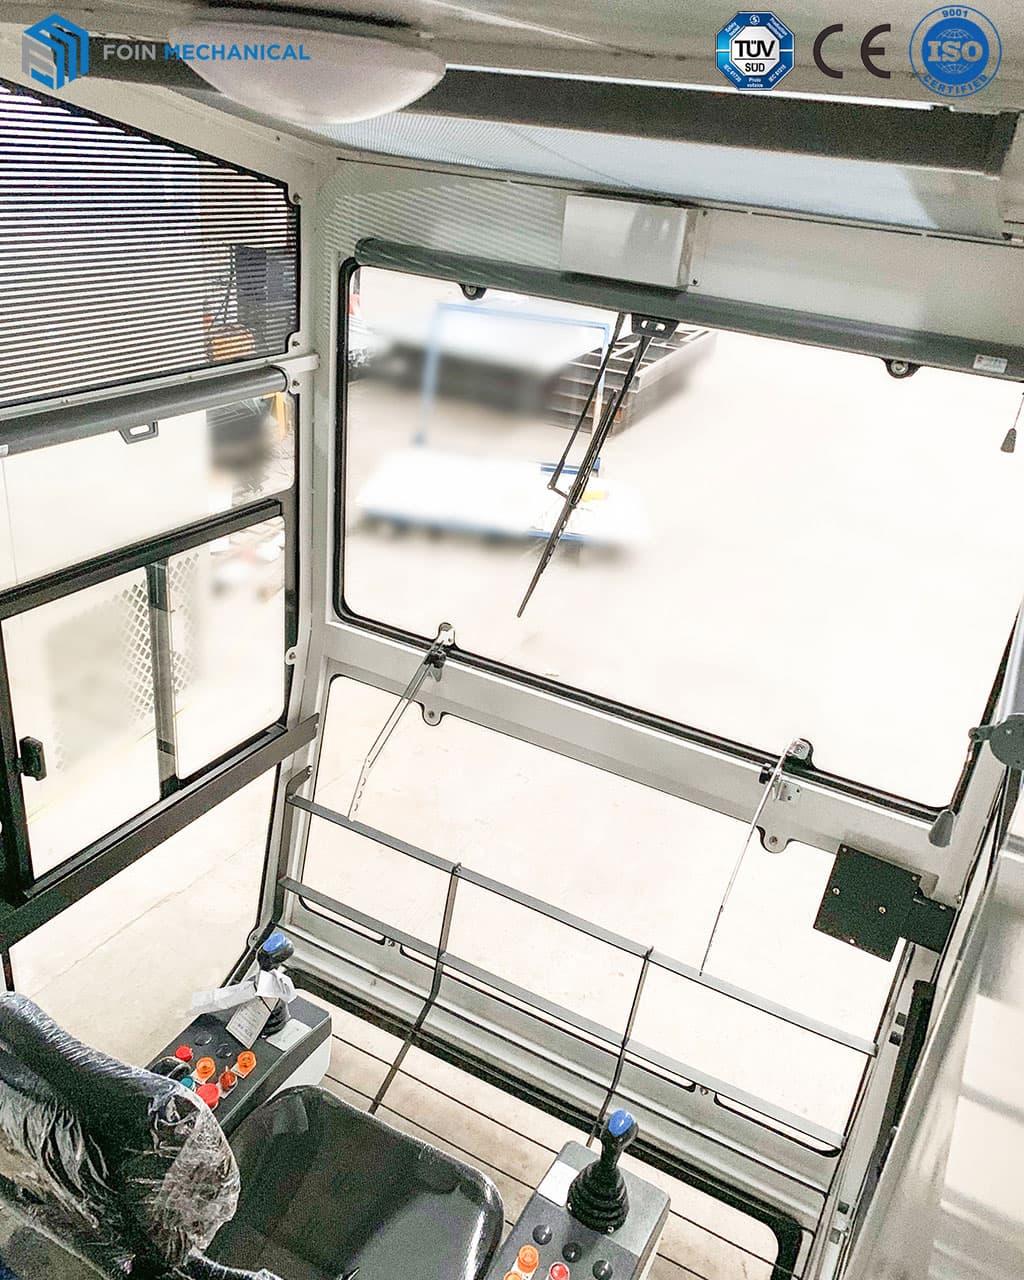 Interior of Tower Cranes Cab